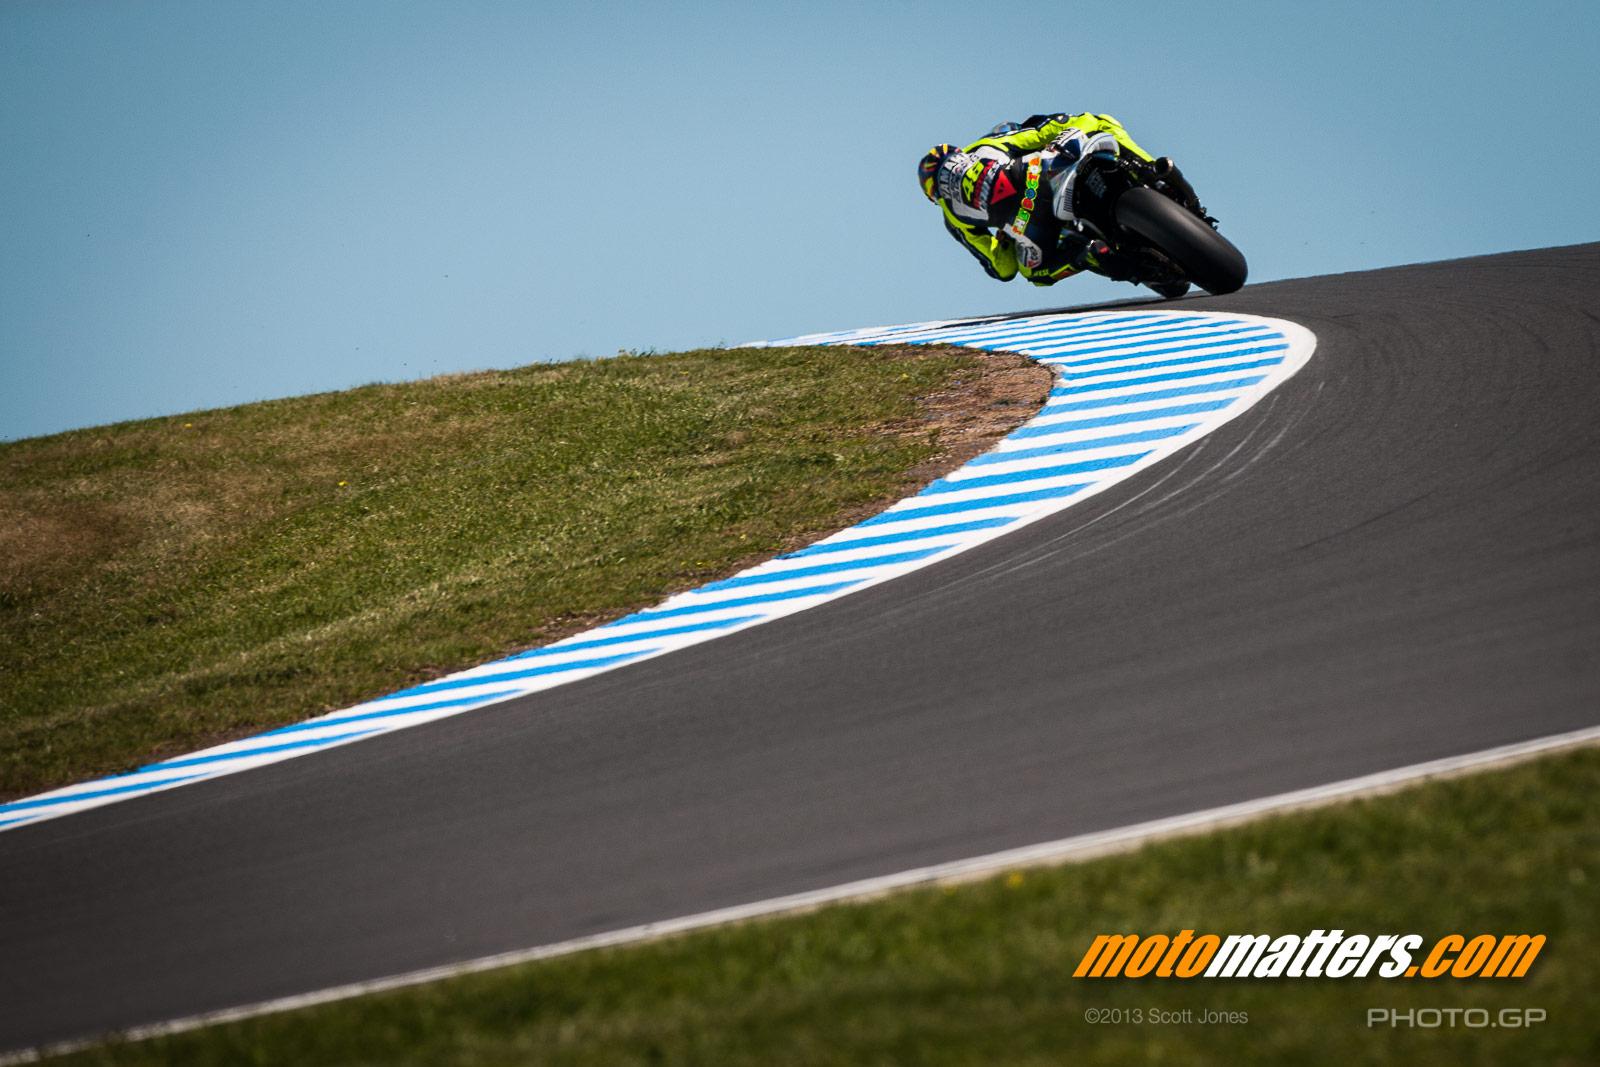 GP Phillip Island - Page 4 2013-MotoGP-16-Phillip-Island-Friday-0658-O